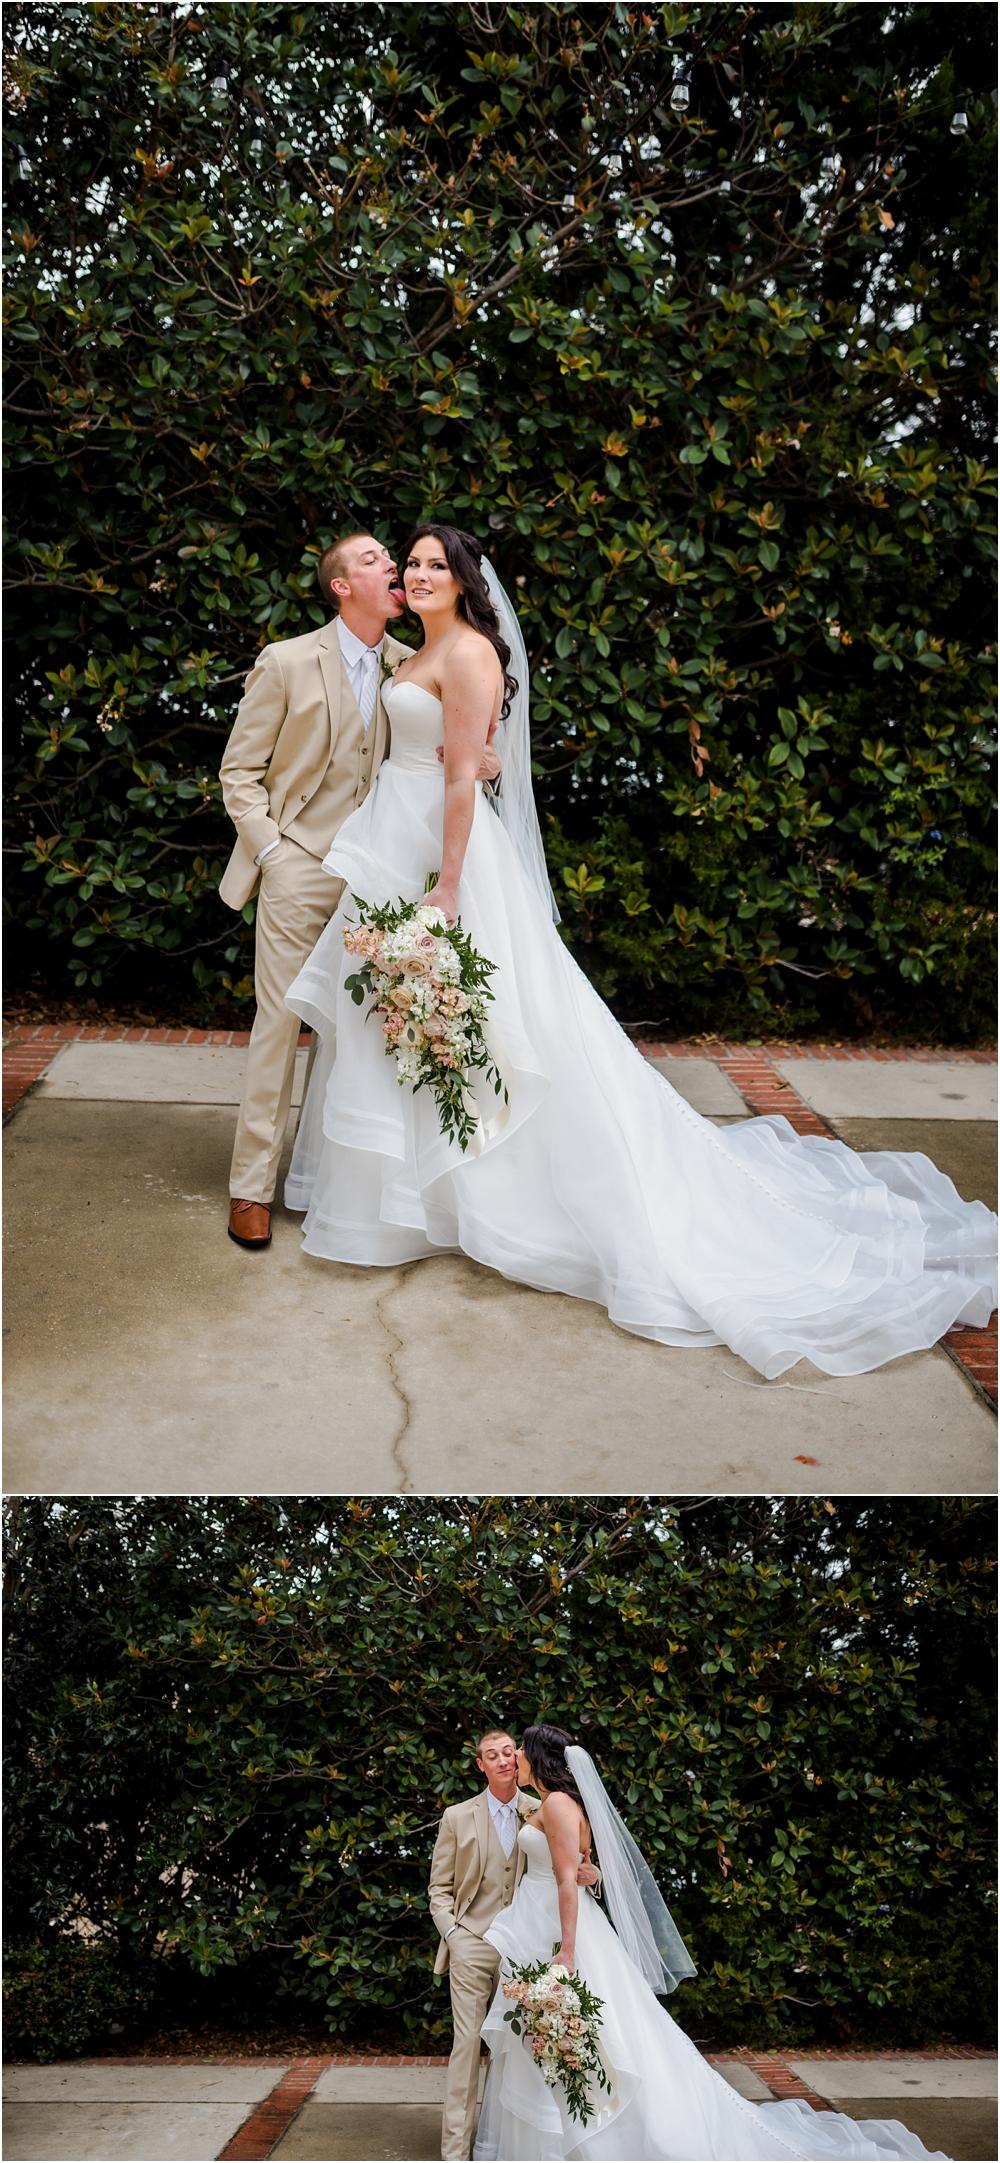 pensacola-wedding-photographer-kiersten-grant-72.jpg